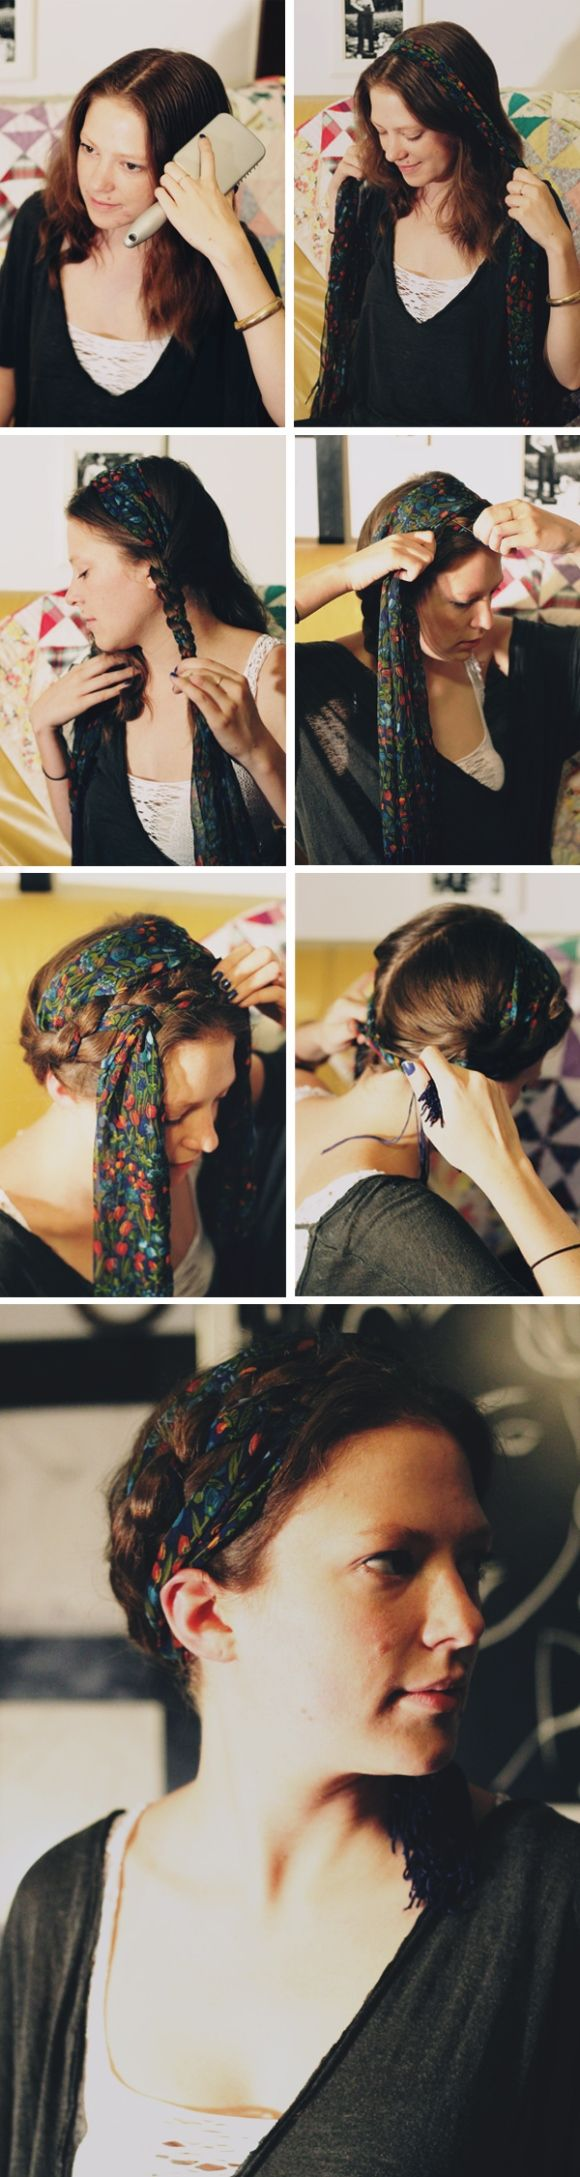 Phenomenal 1000 Ideas About Scarf Hairstyles On Pinterest Sarah Angius Hairstyles For Women Draintrainus